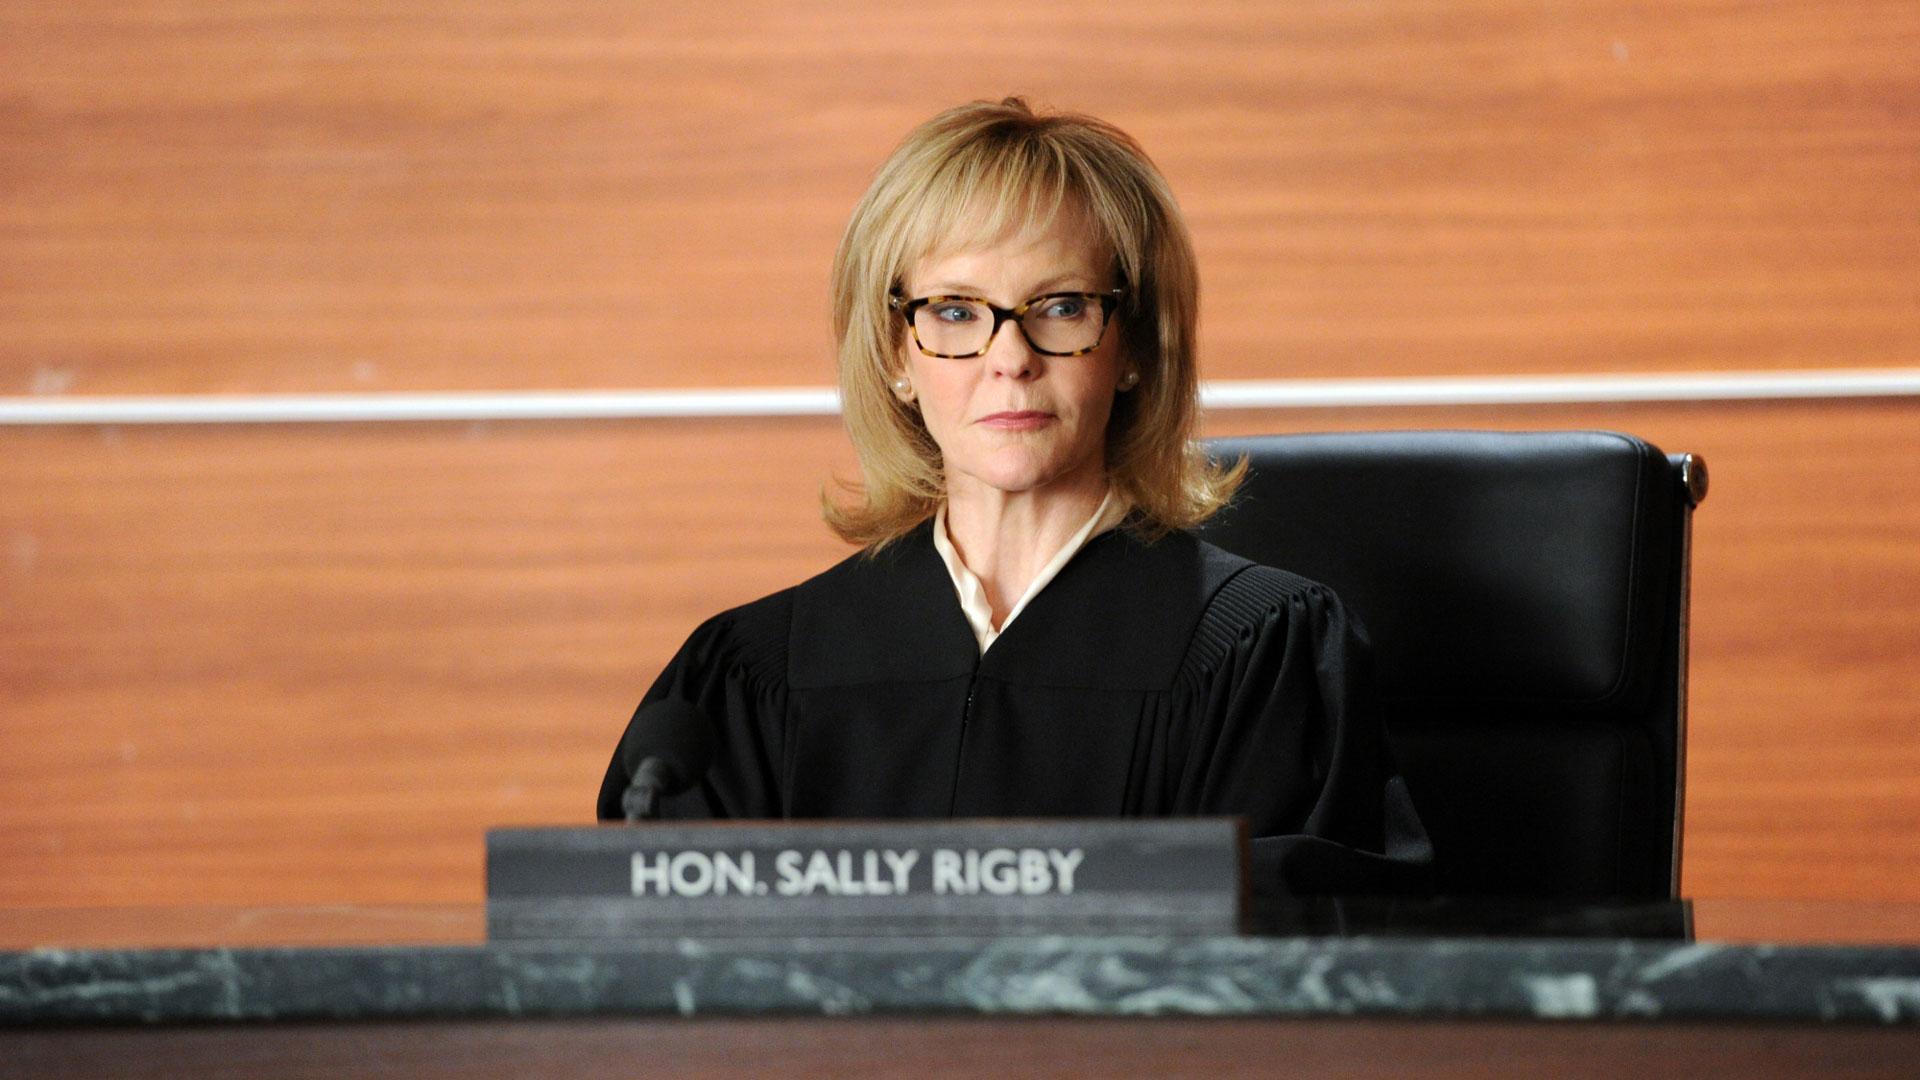 Judge Sally Rigby (Deborah Rush)